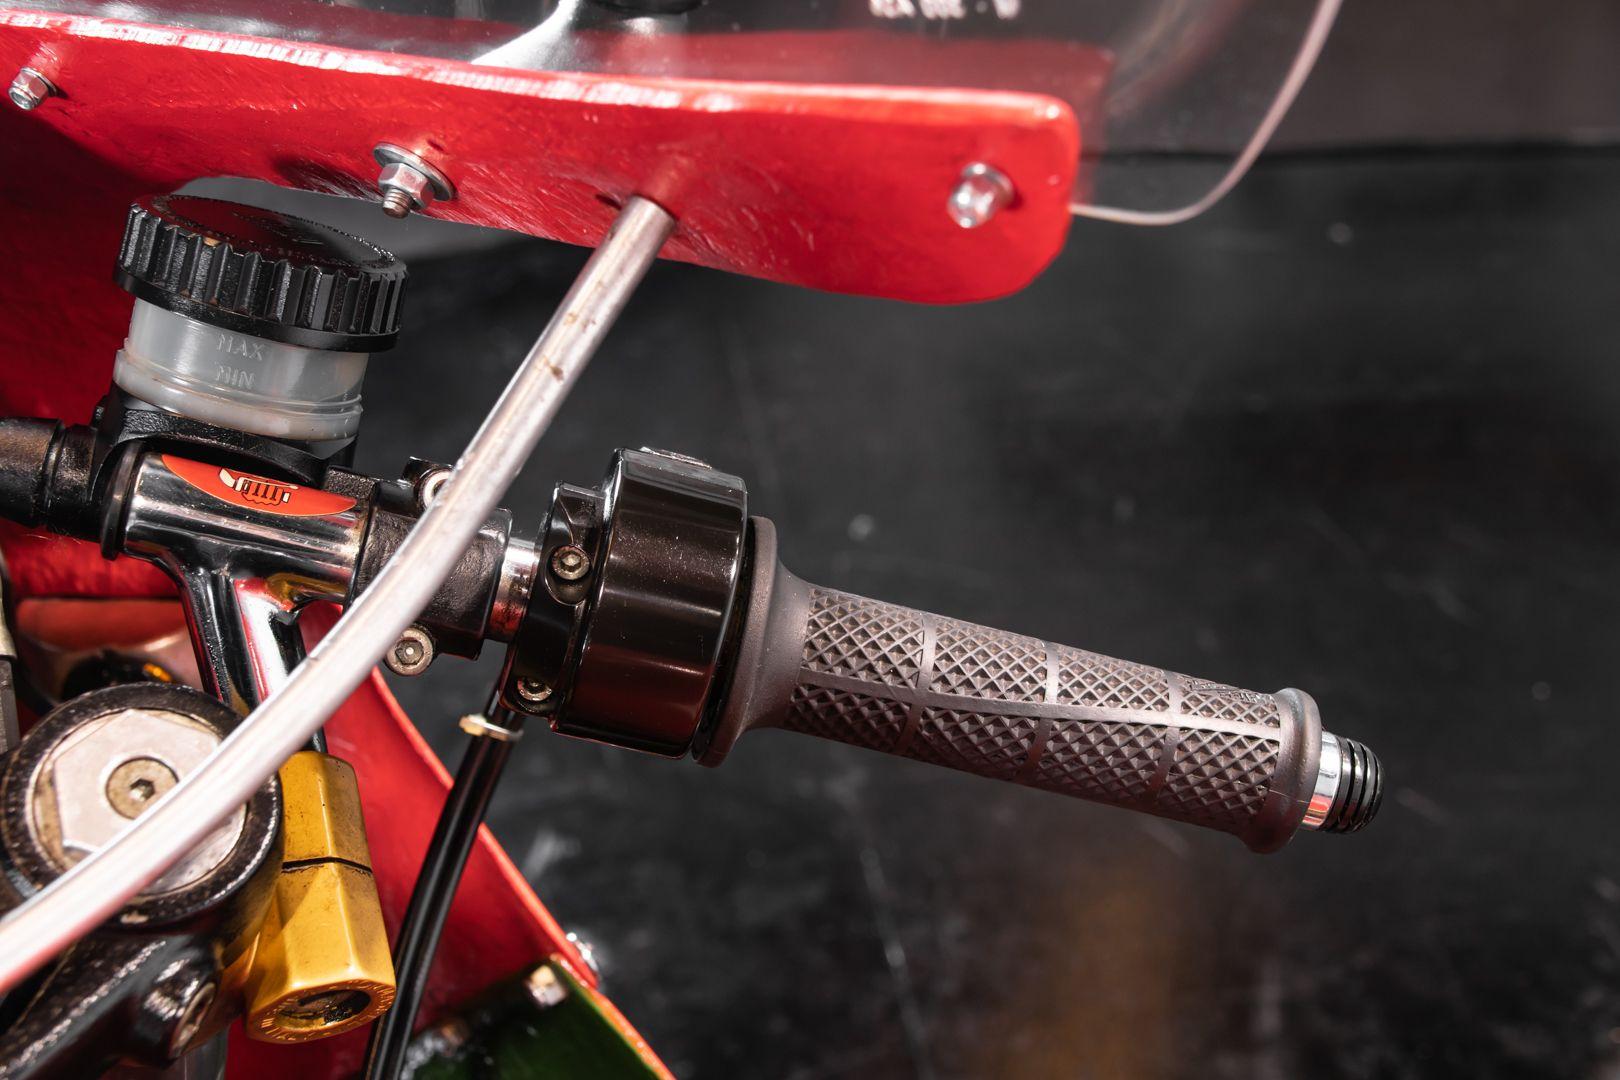 1983 Ducati 900 Mike Hailwood Replica 71430